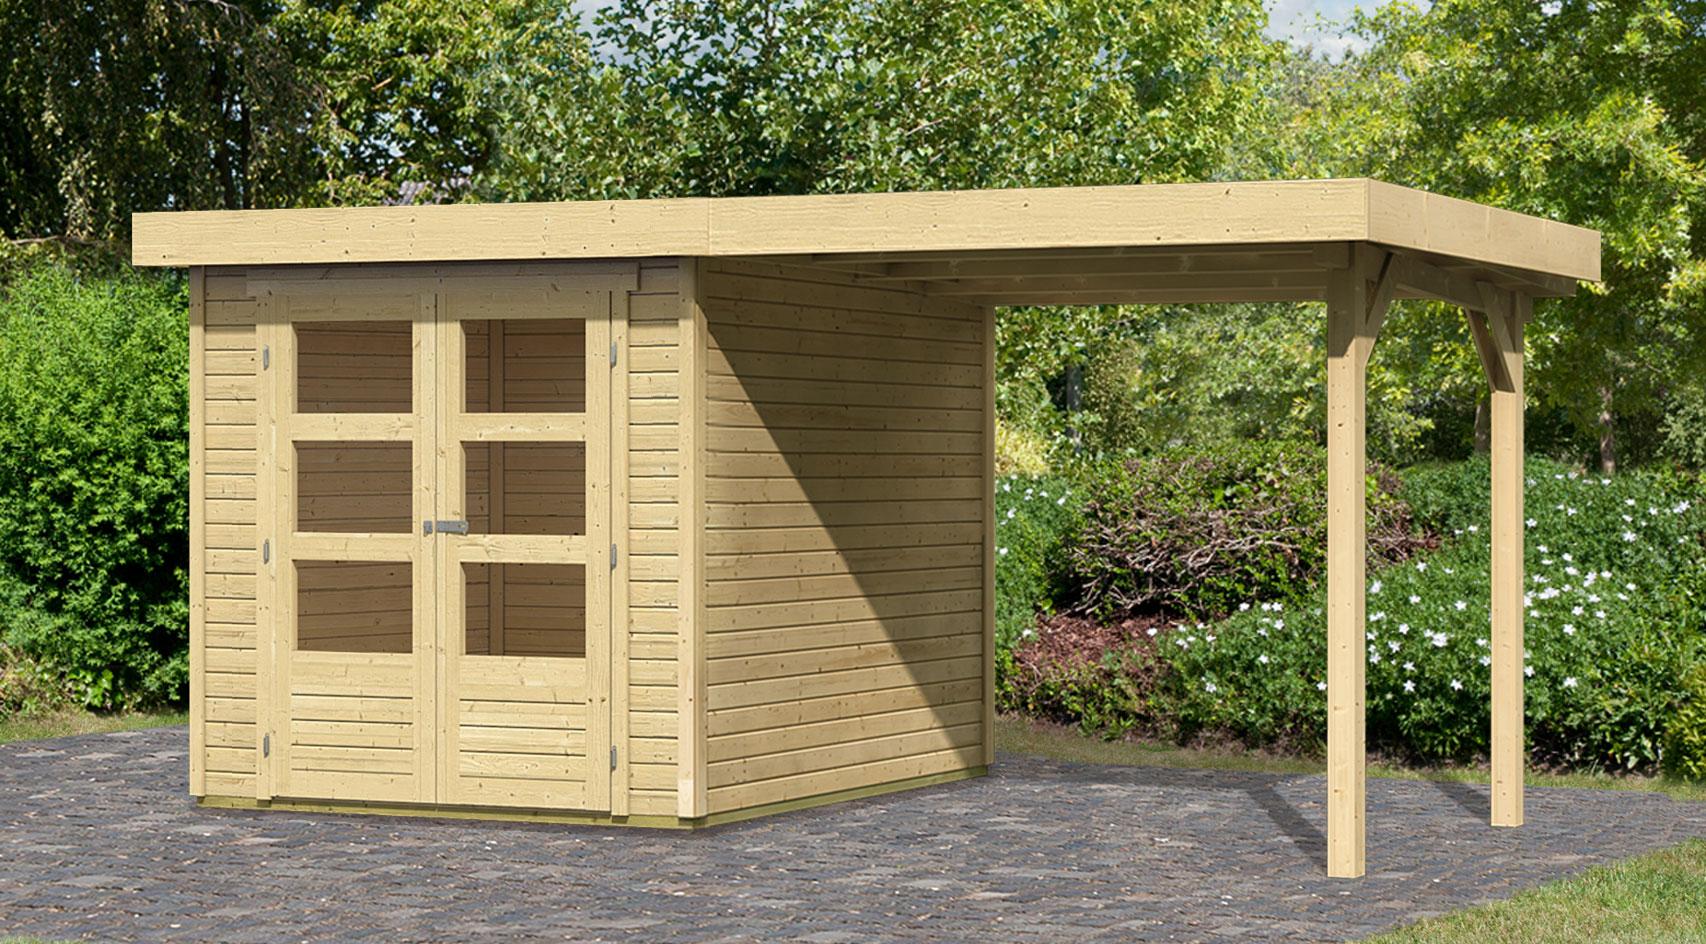 woodfeeling gartenhaus 19mm askola 2 natur 237x237cm schleppdach bei. Black Bedroom Furniture Sets. Home Design Ideas